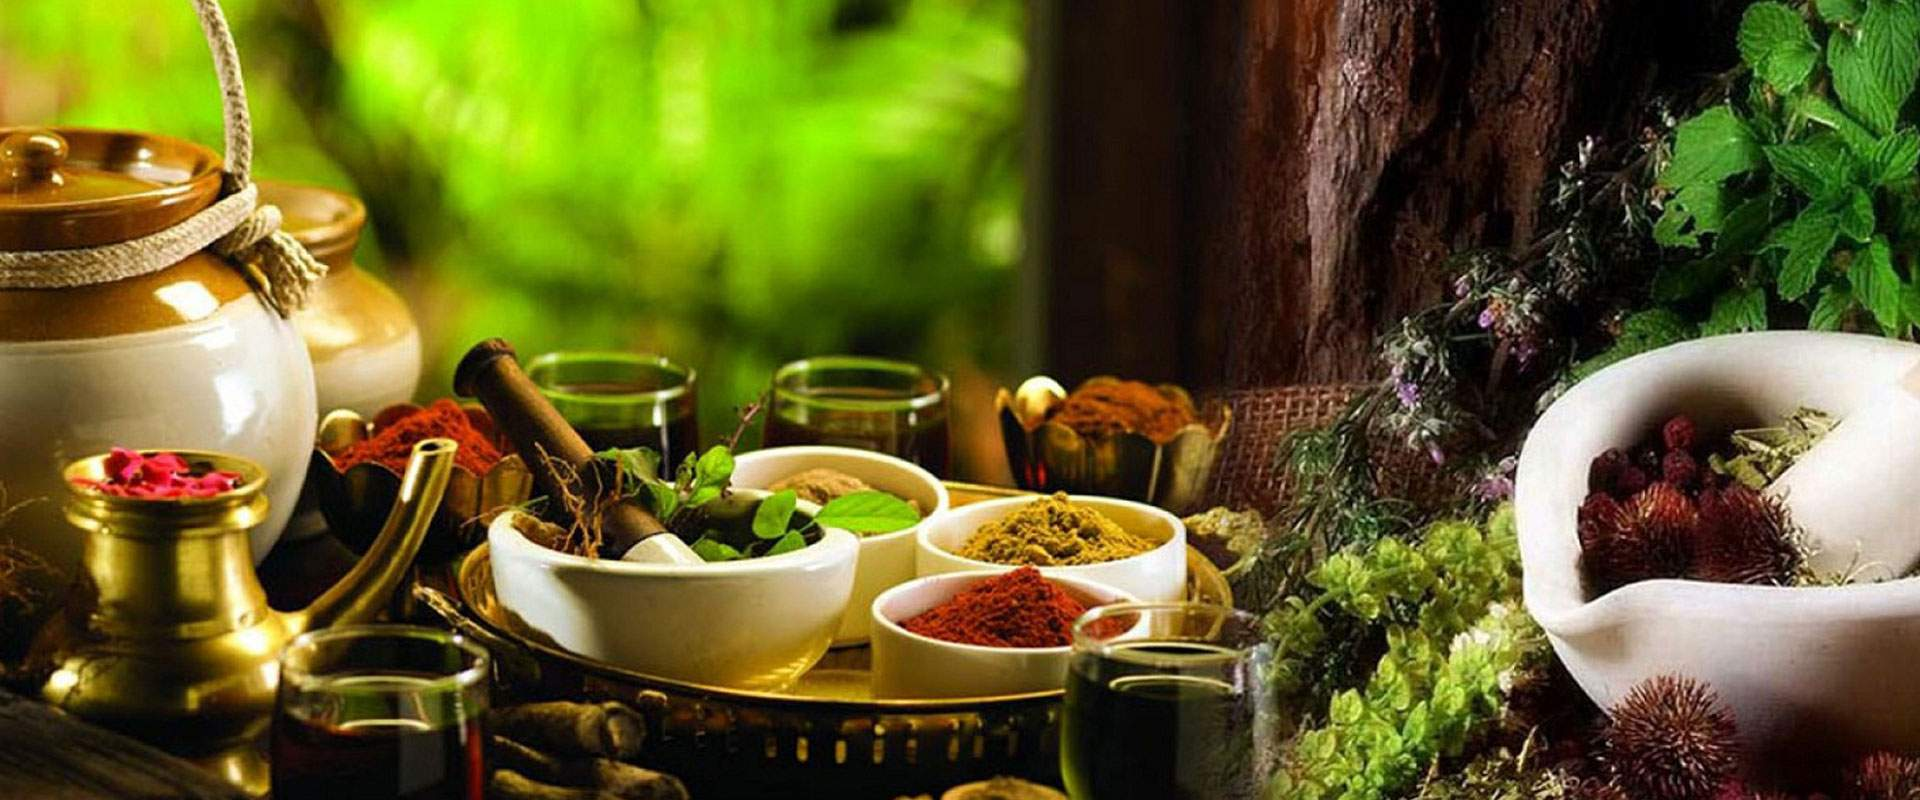 Ayurvedic Medicine Images